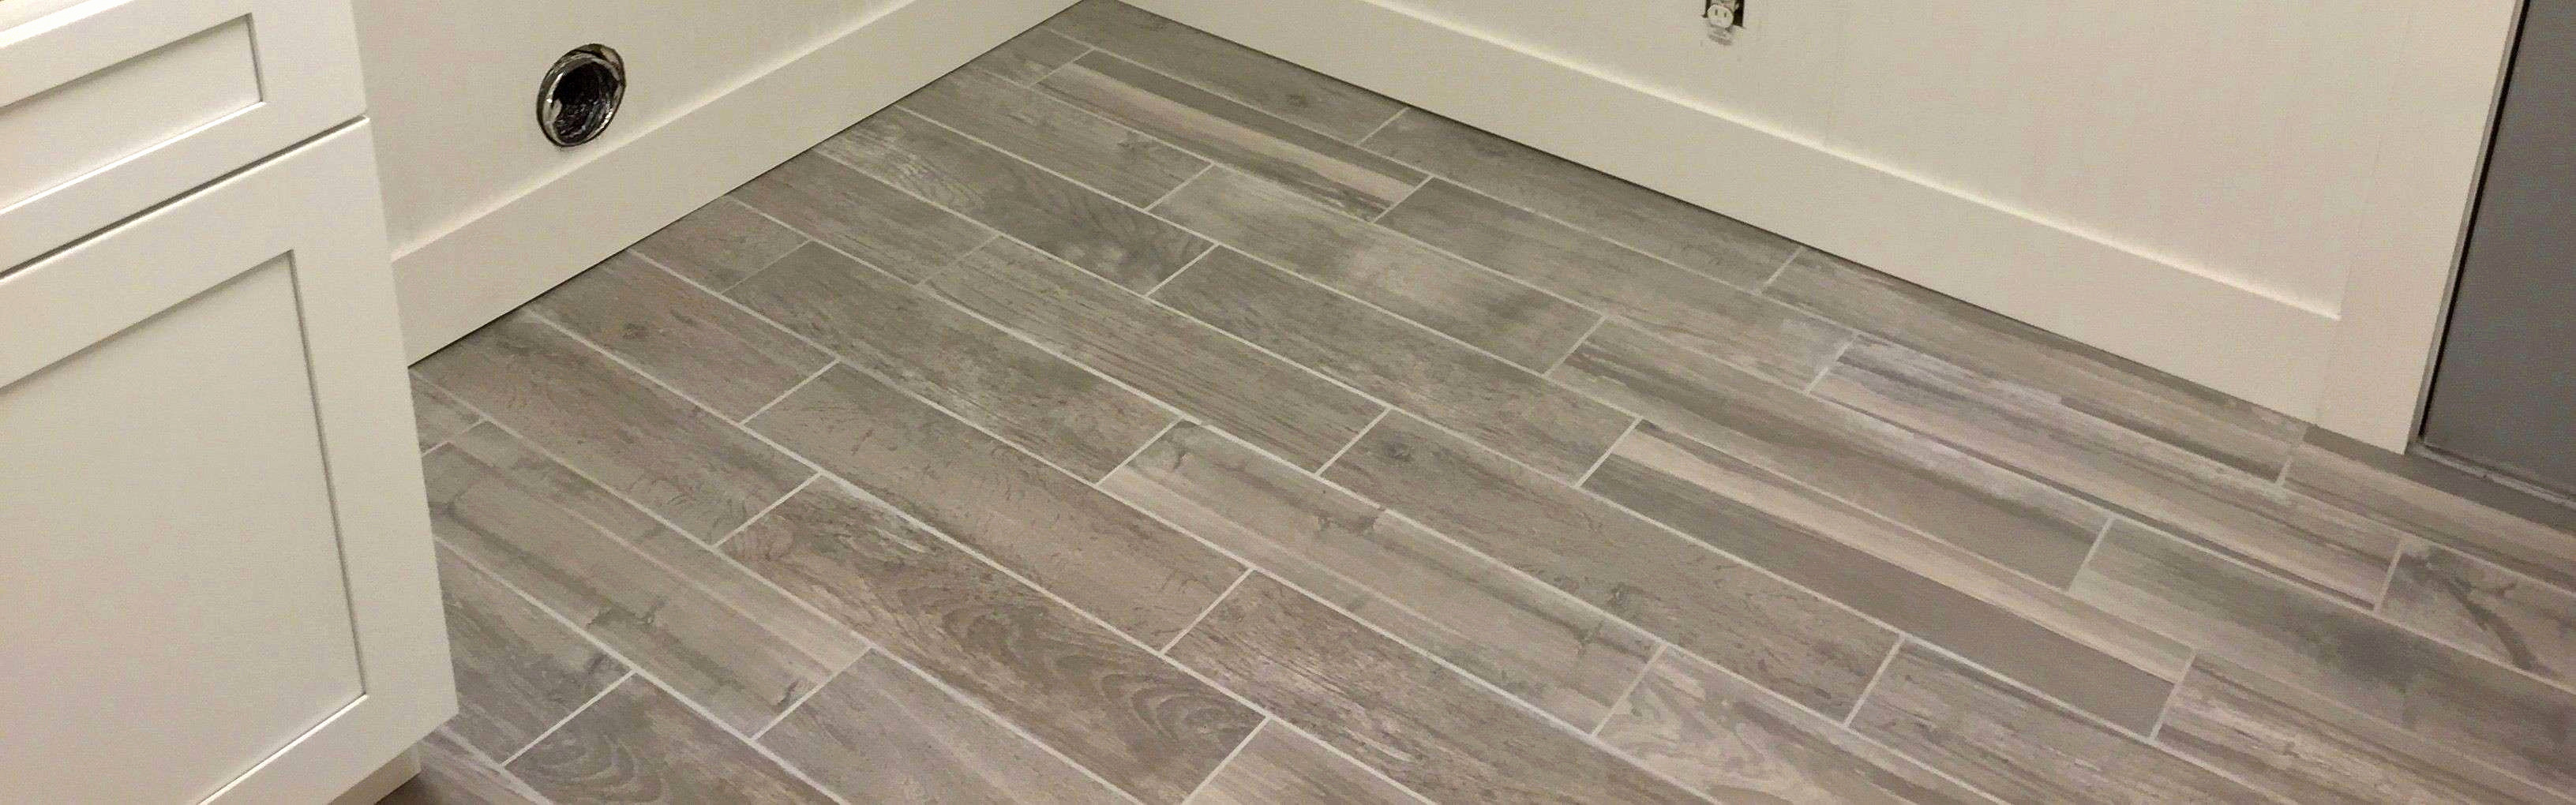 hardwood flooring companies in michigan of wood floor store floor plan ideas intended for unique bathroom tiling ideas best h sink install bathroom i 0d exciting beautiful fresh bathroom floor